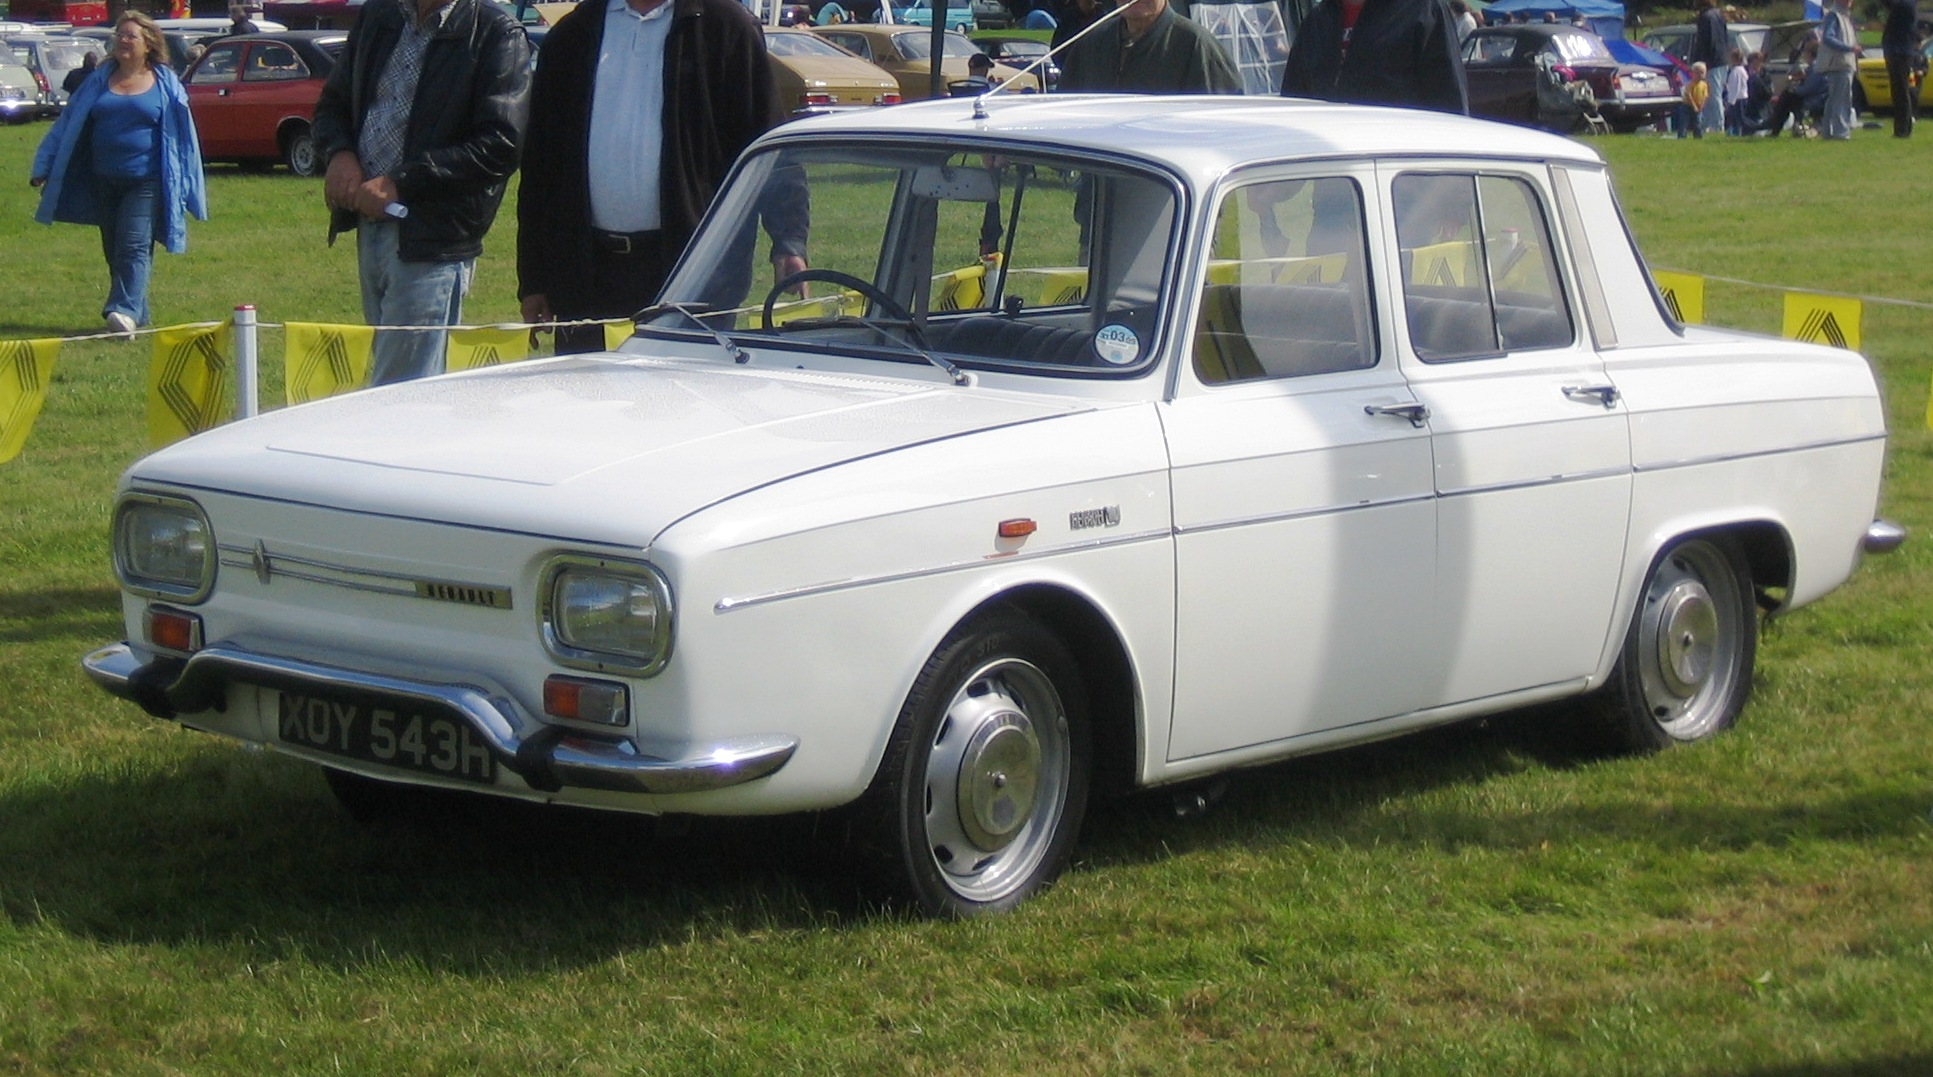 Car history search australia zacatecas